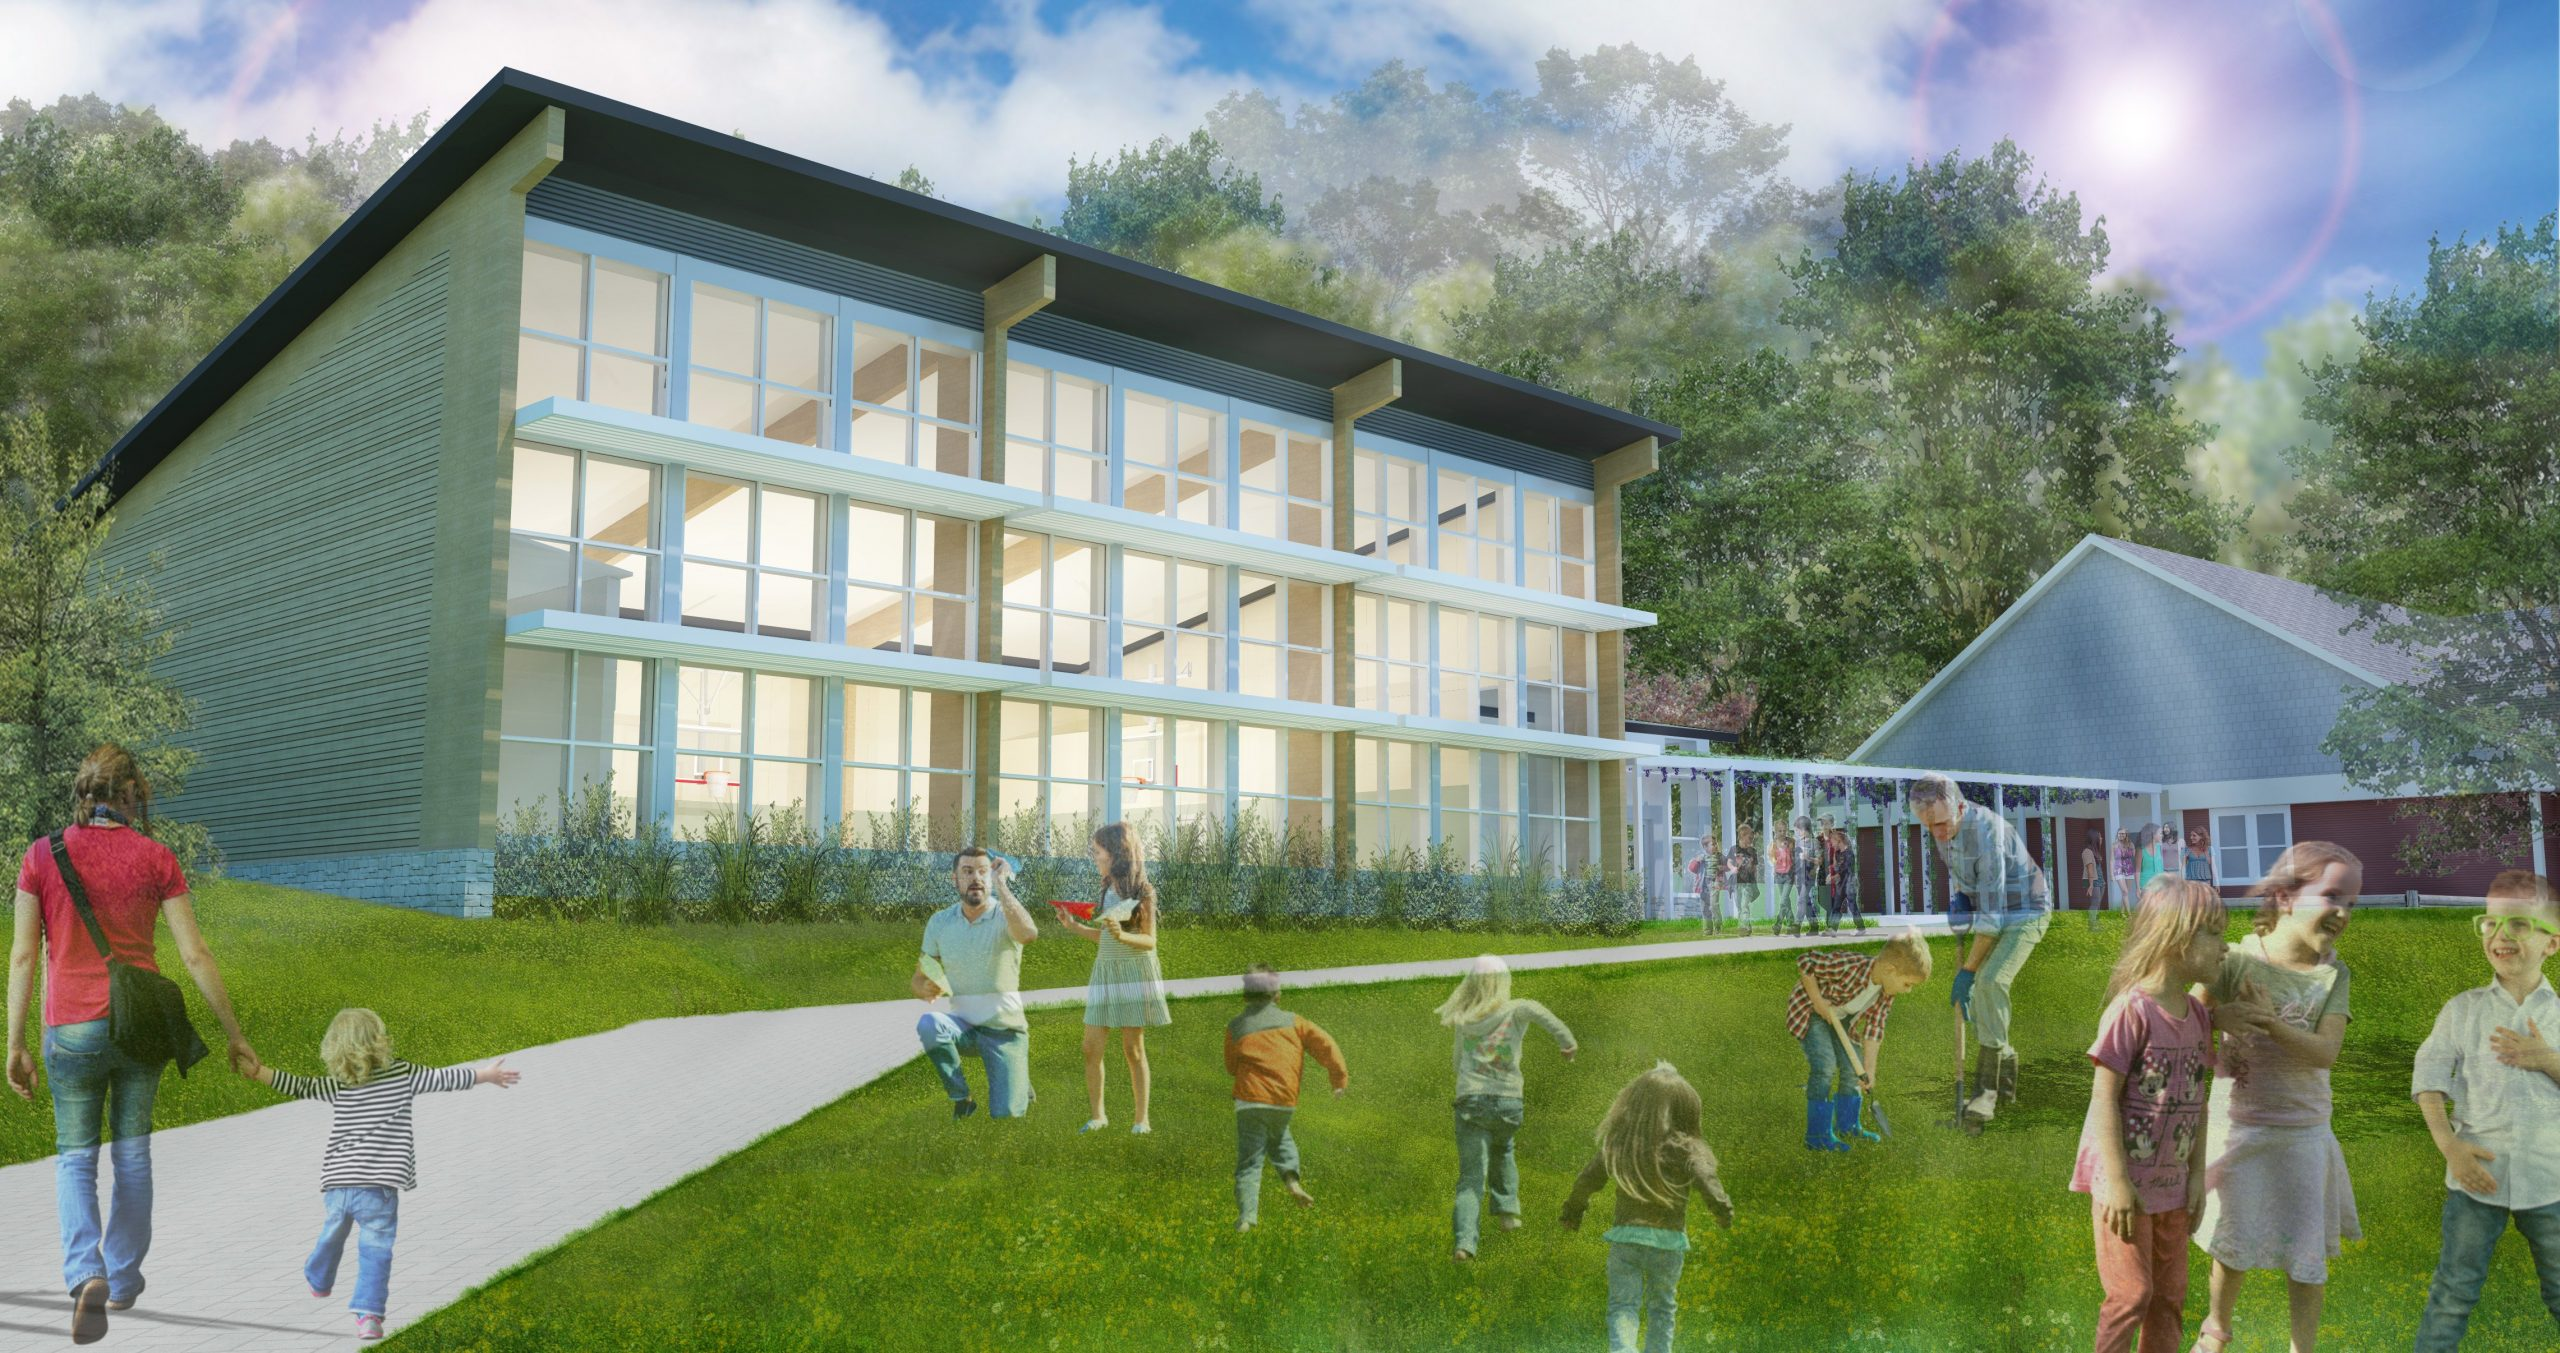 Touchstone Community School, Rendering